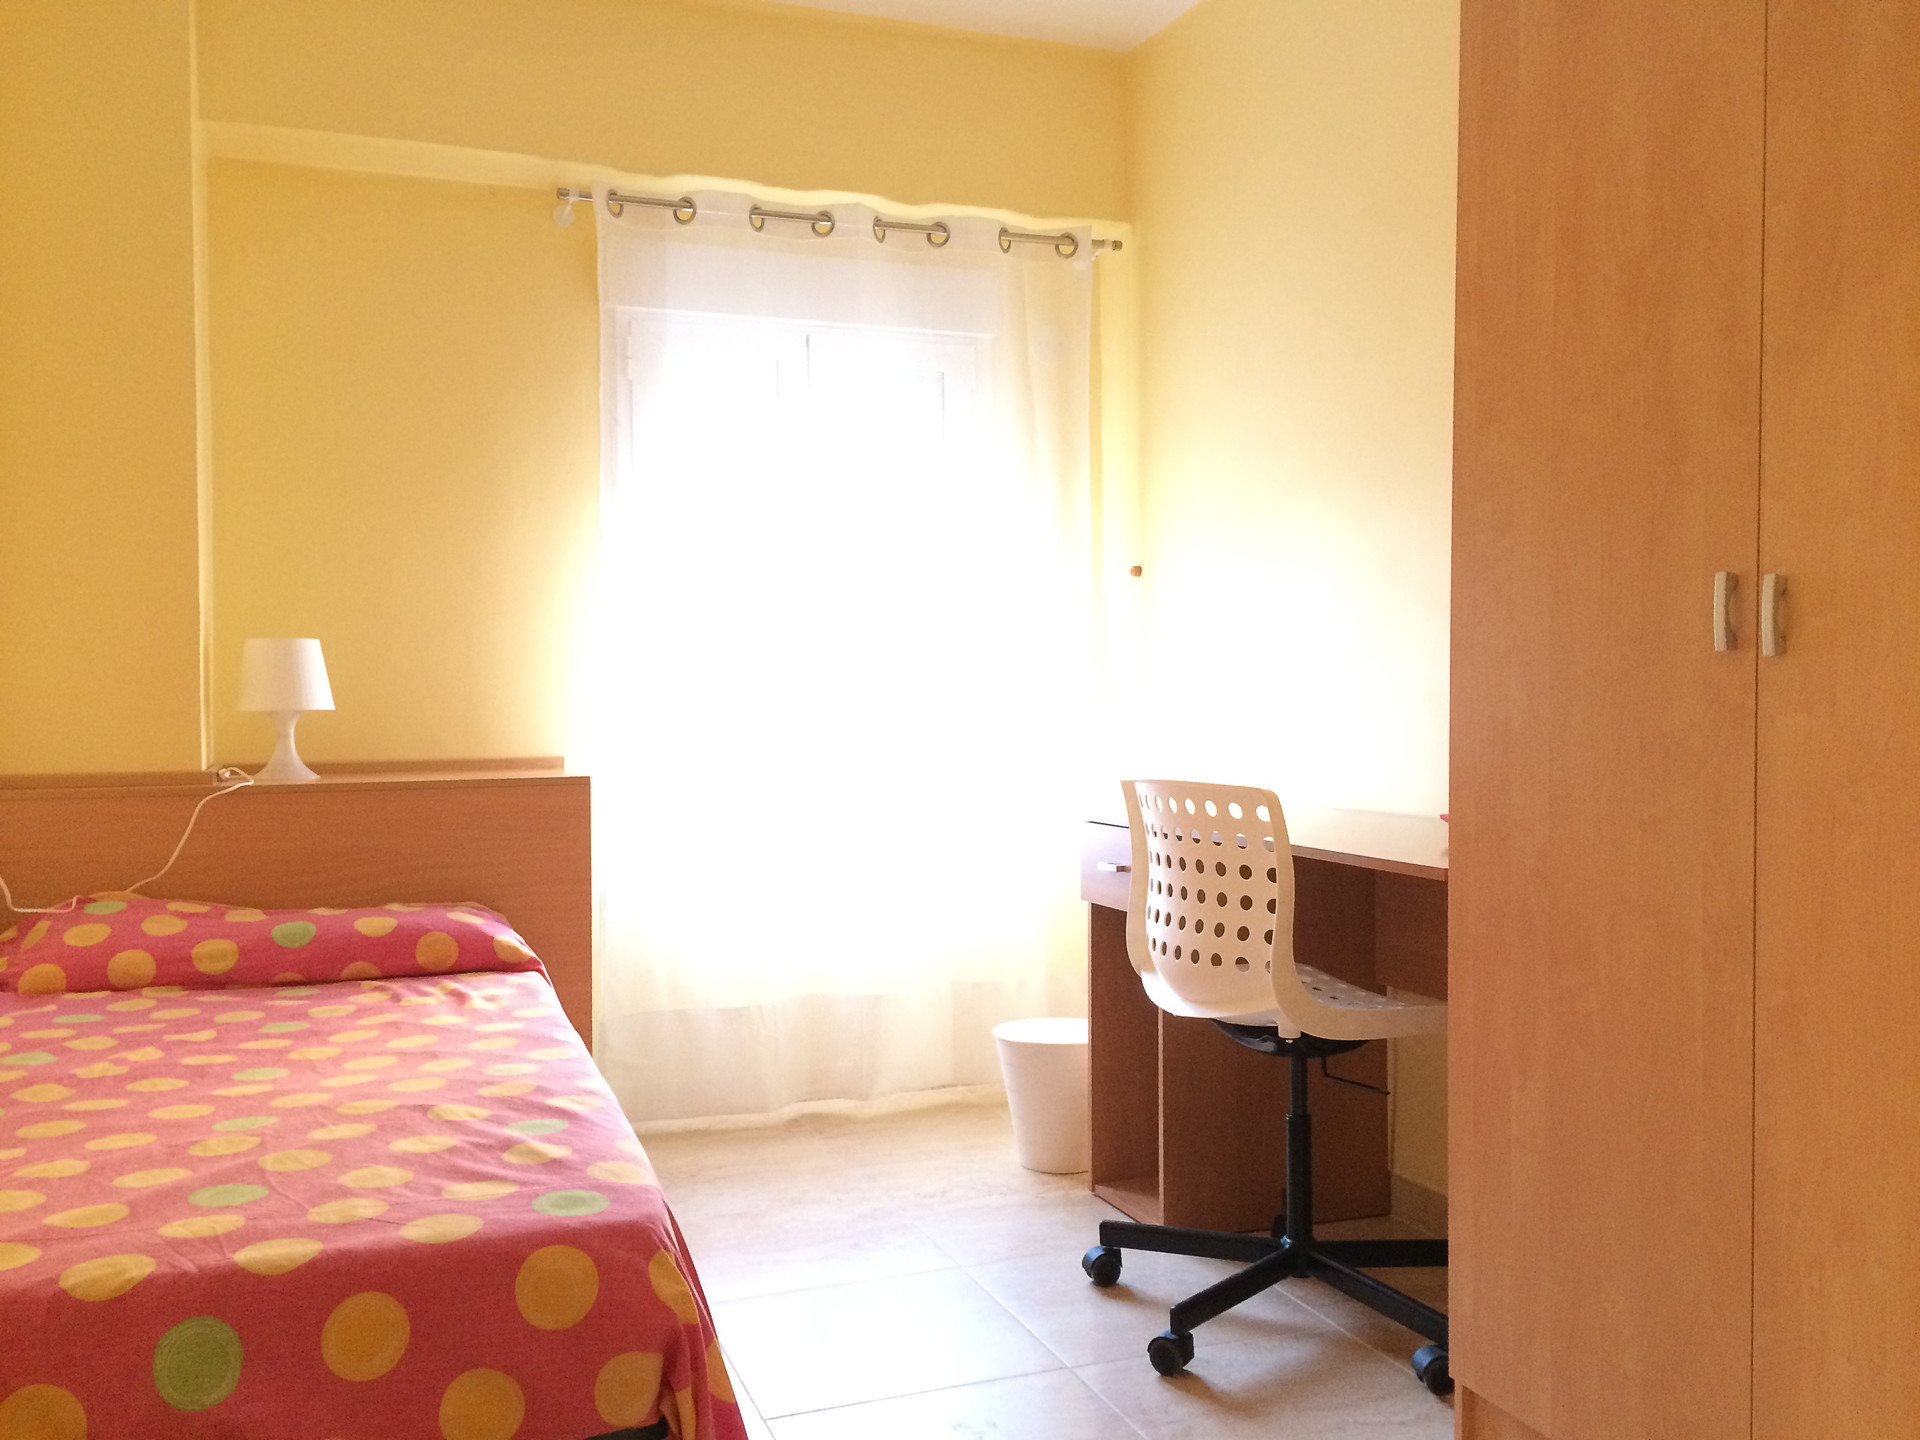 Habitaci n para chica estudiante alquiler habitaciones valencia - Loquo valencia alquiler habitacion ...